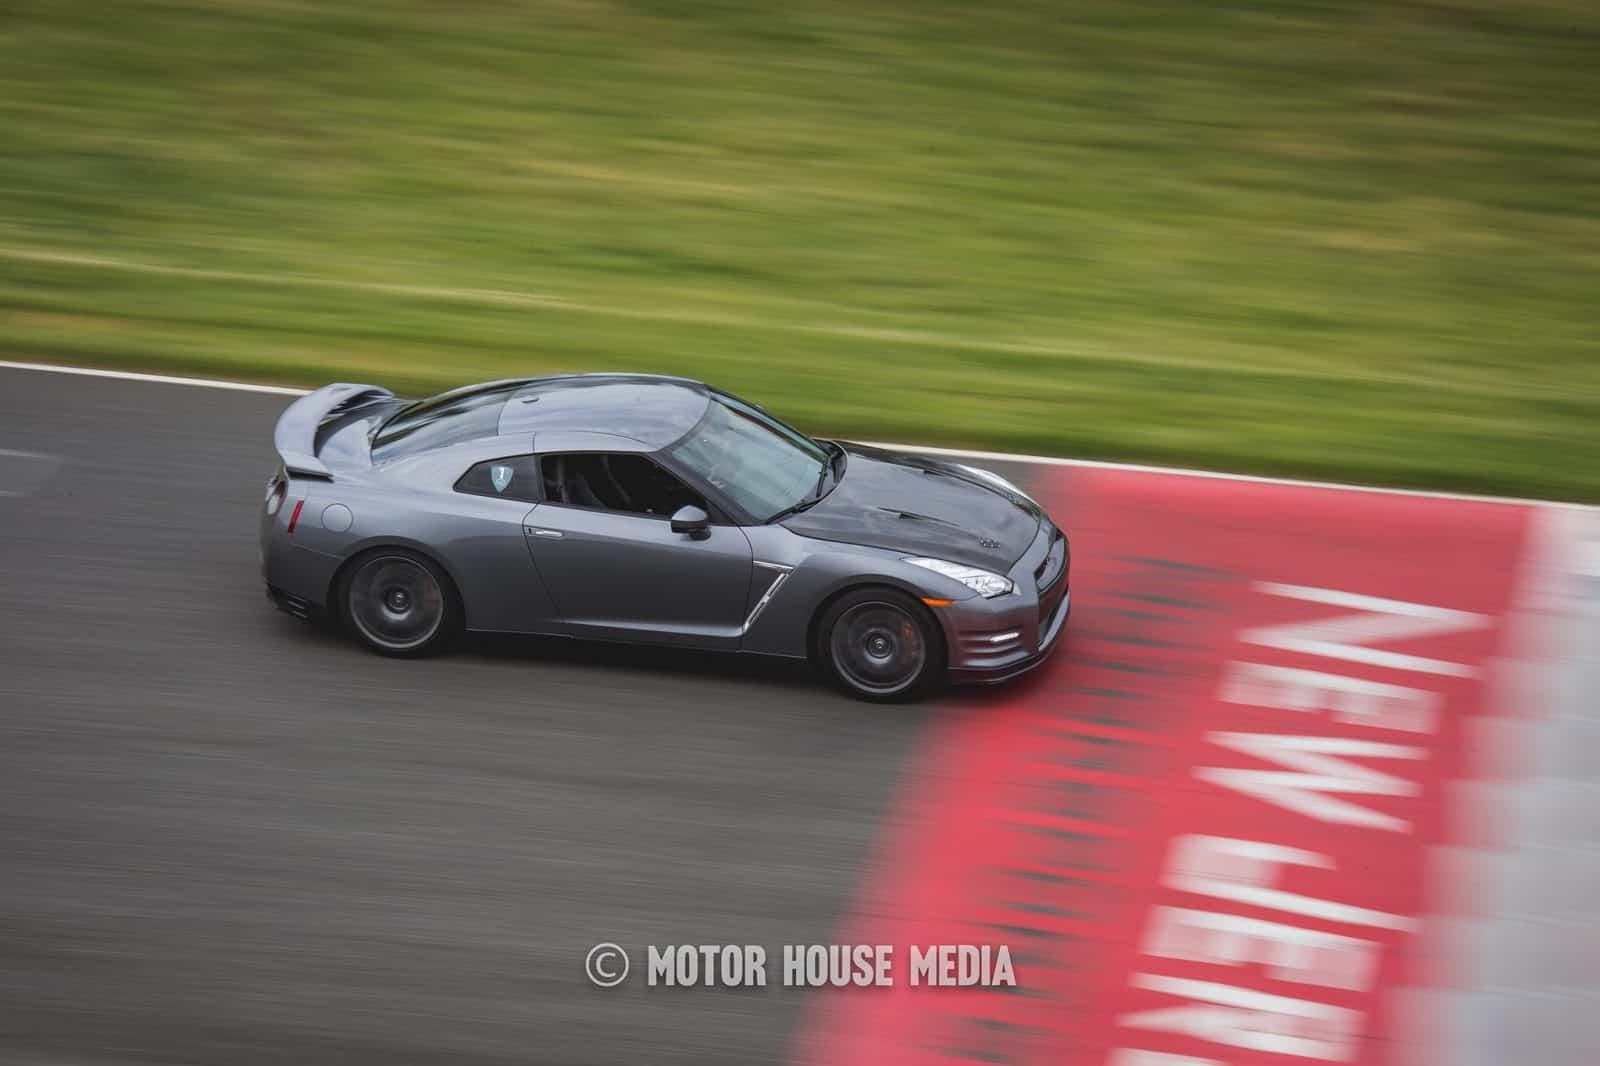 GTR roll racing at njmp